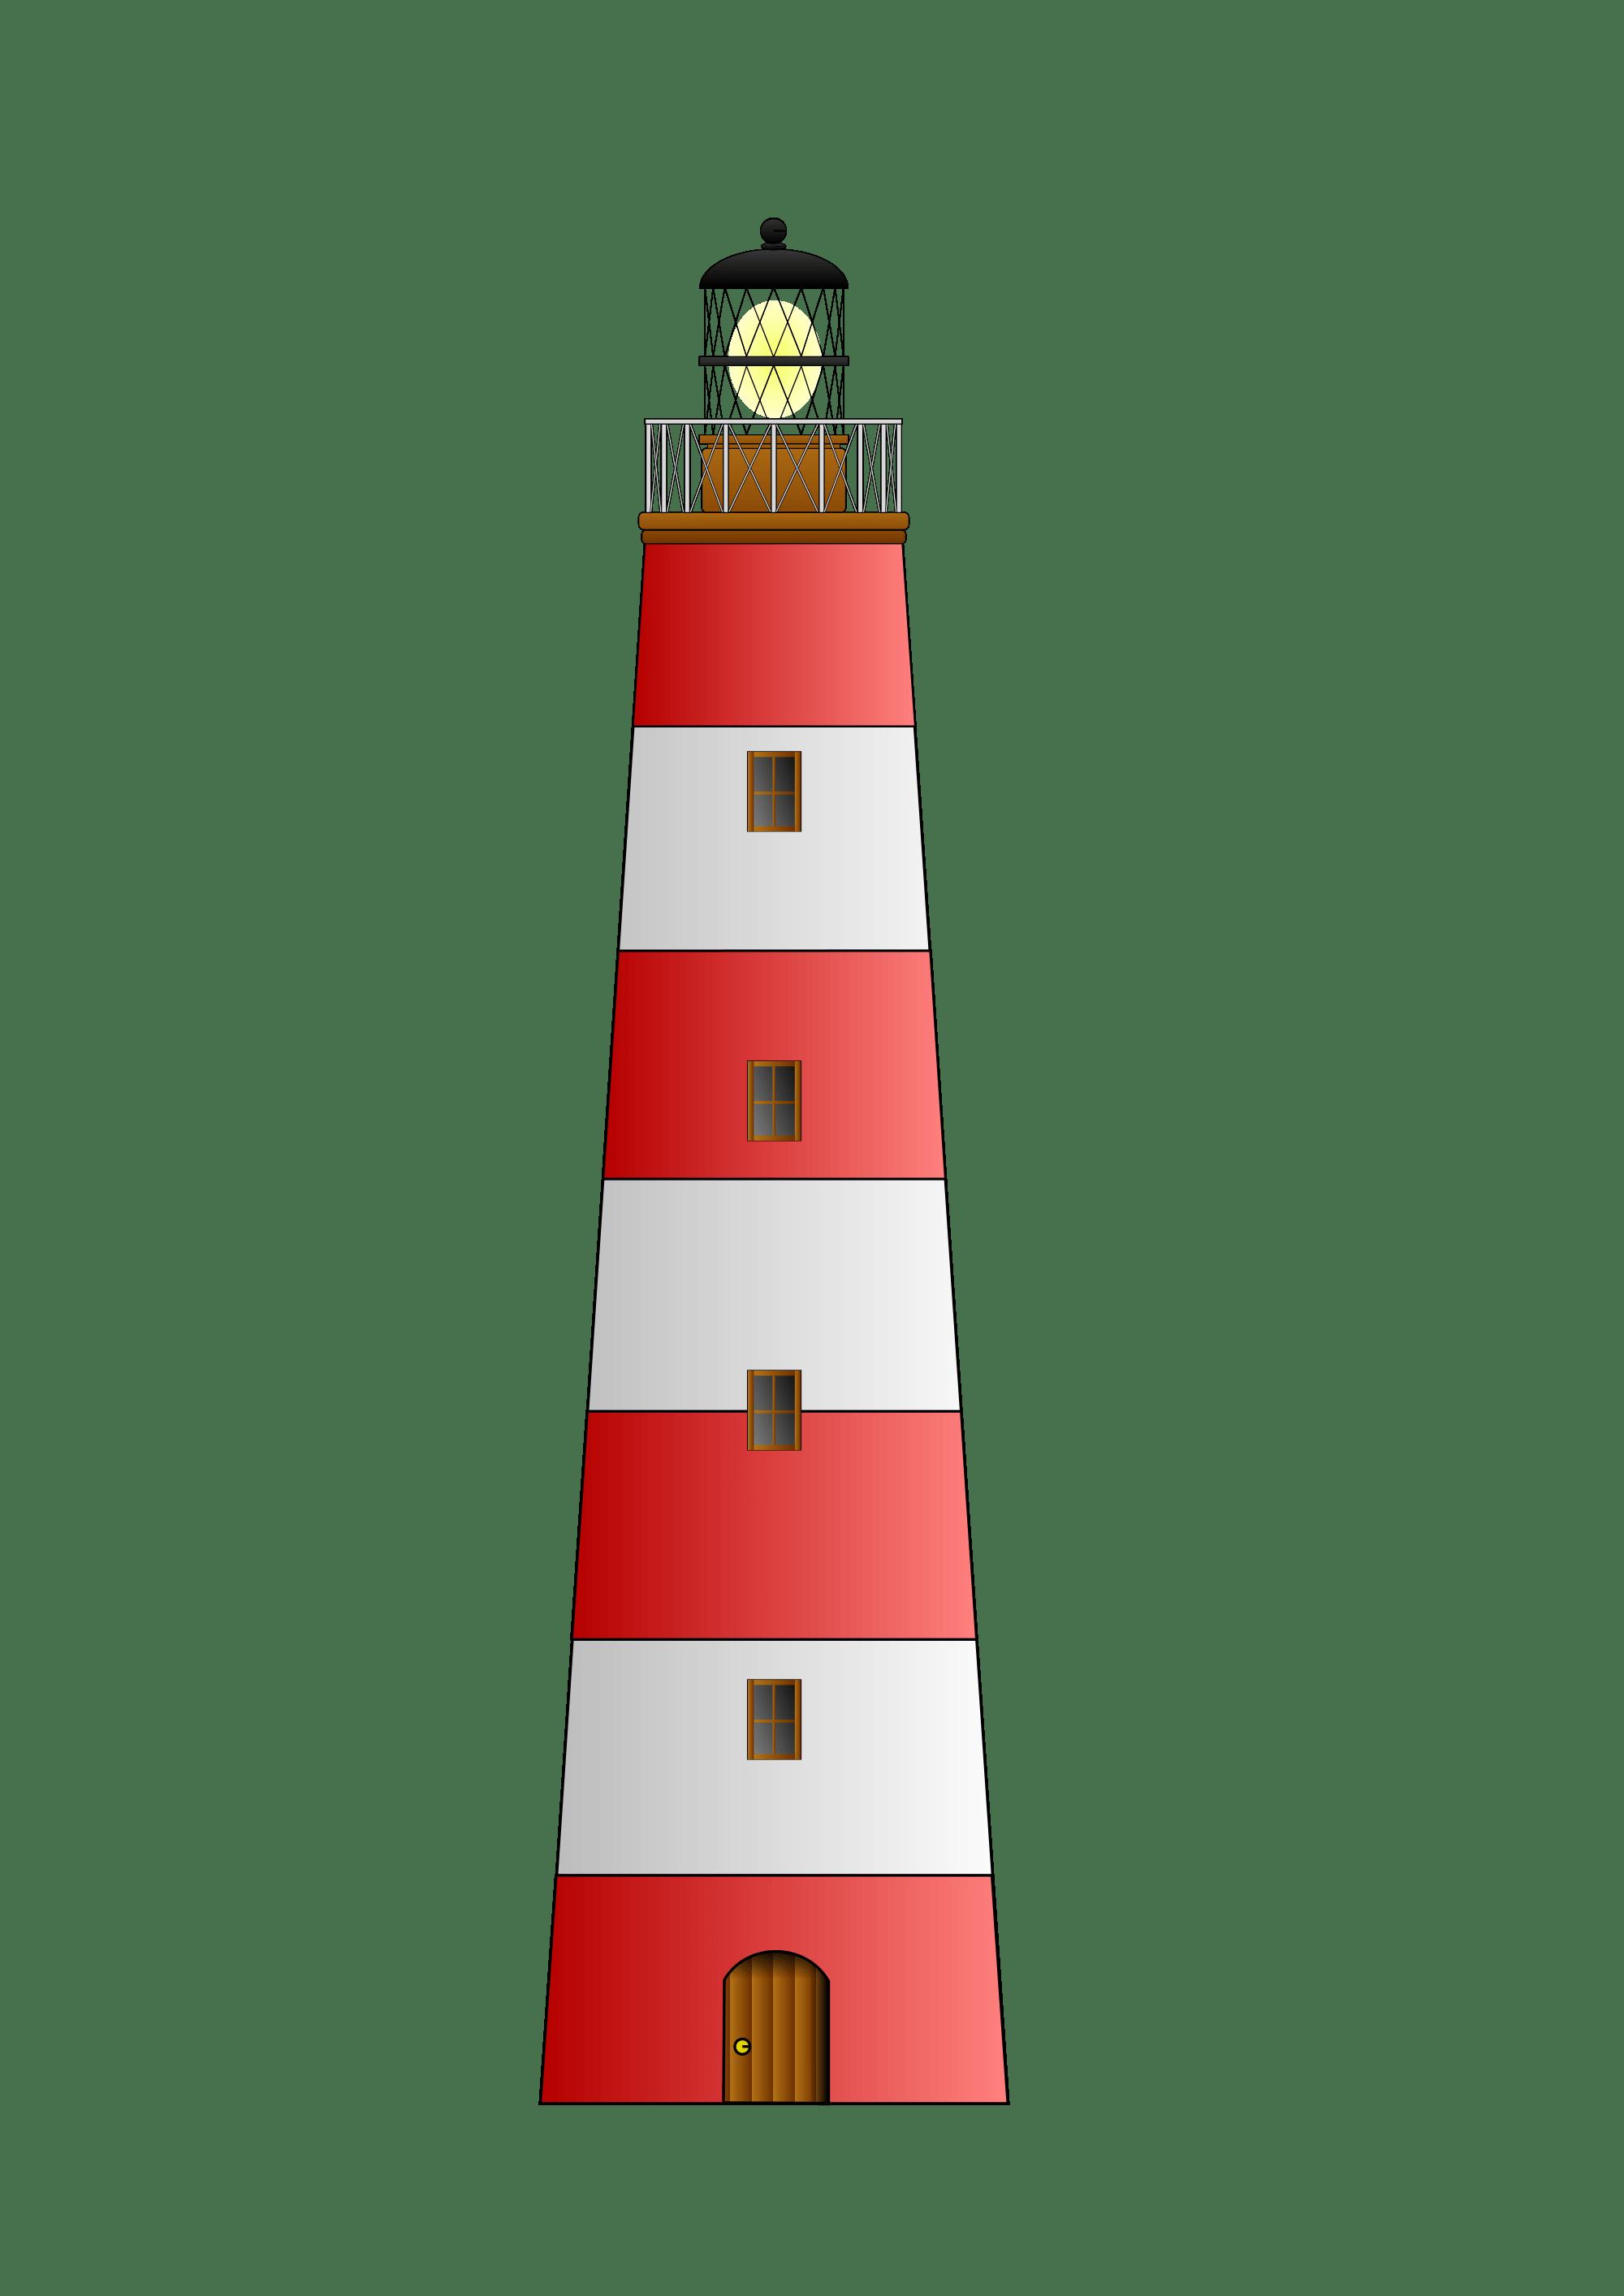 Lighthouse clip art clipart. Light house png